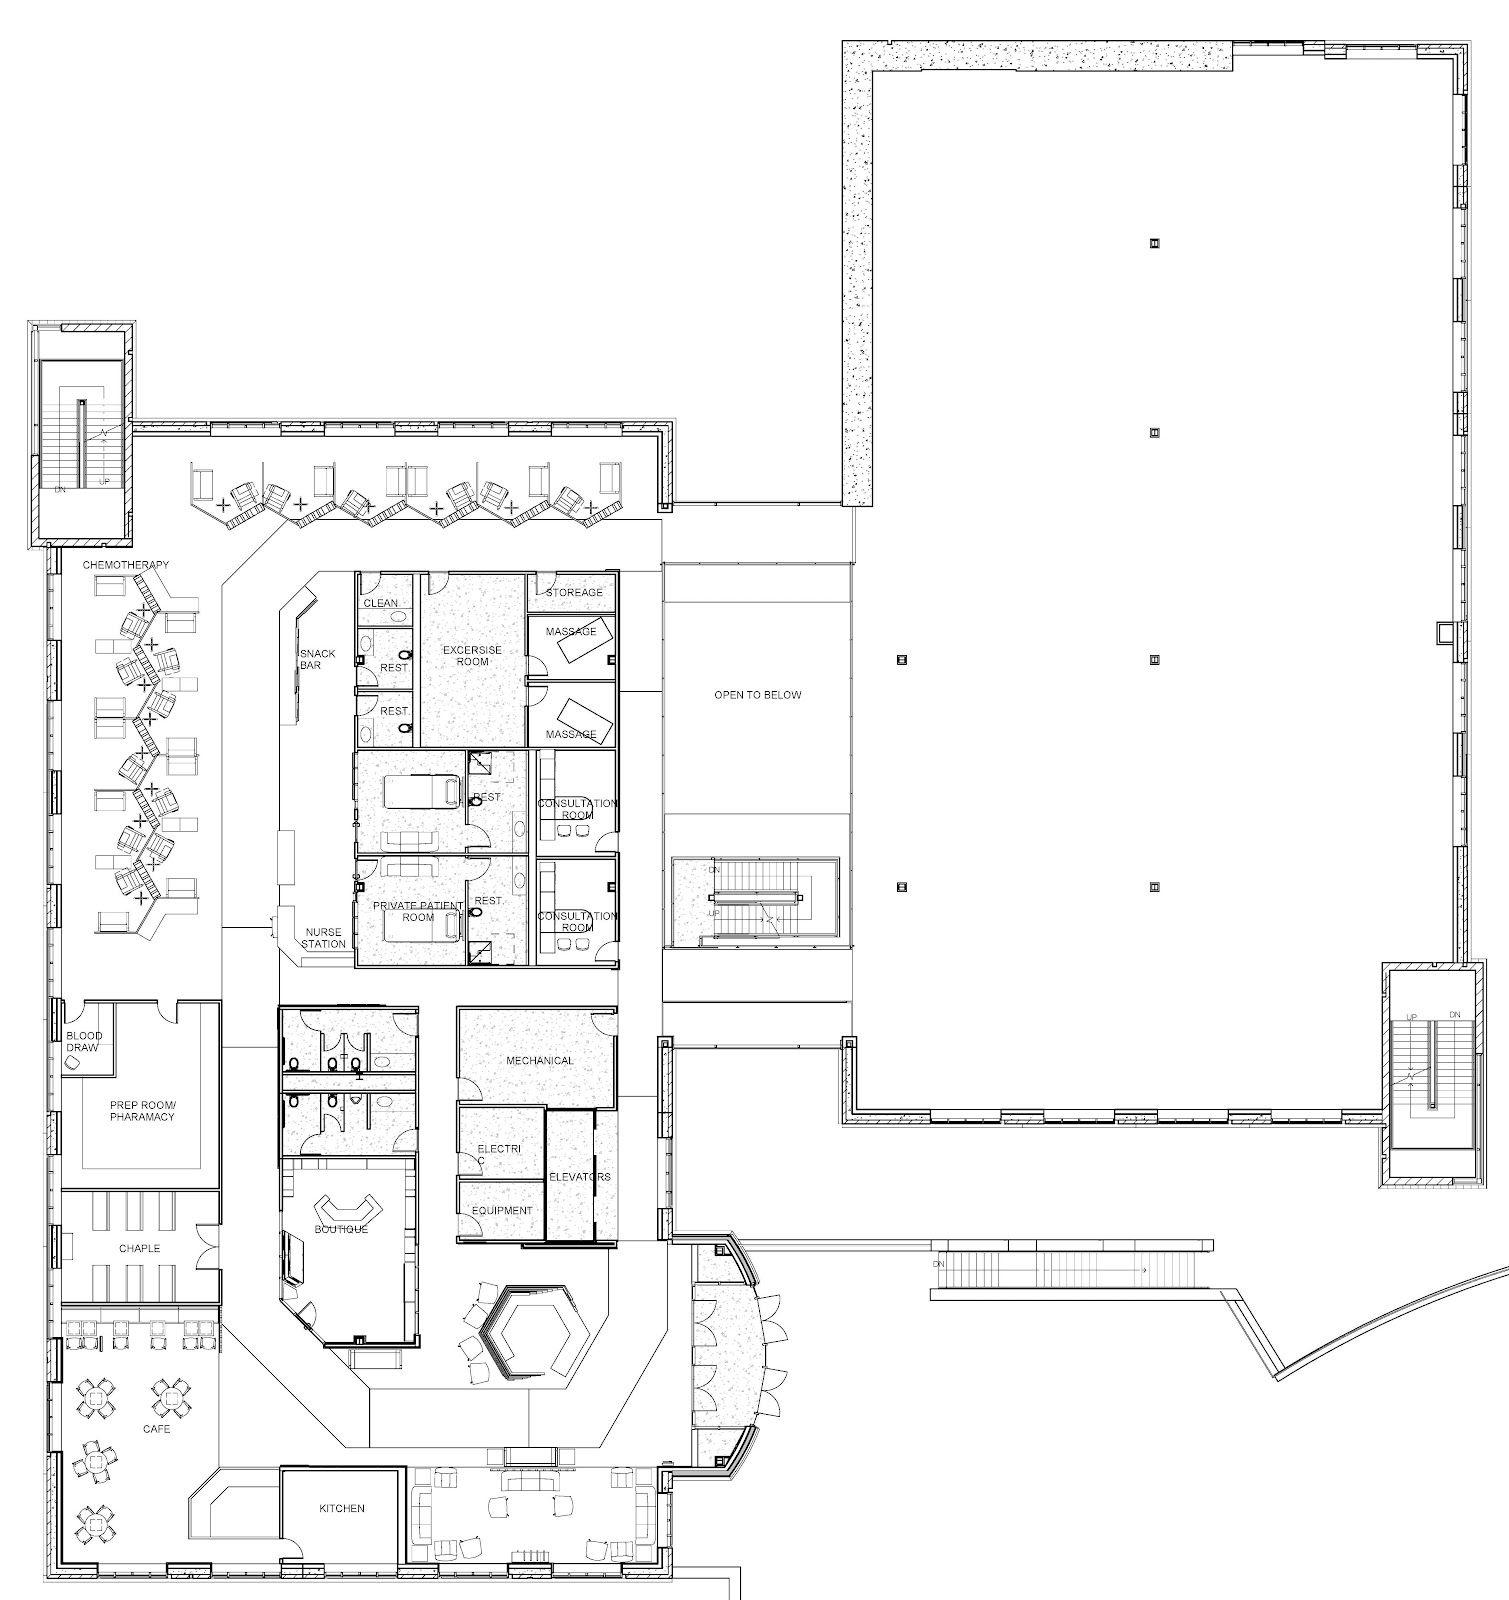 oncology center floor plans First Floor Plan Health